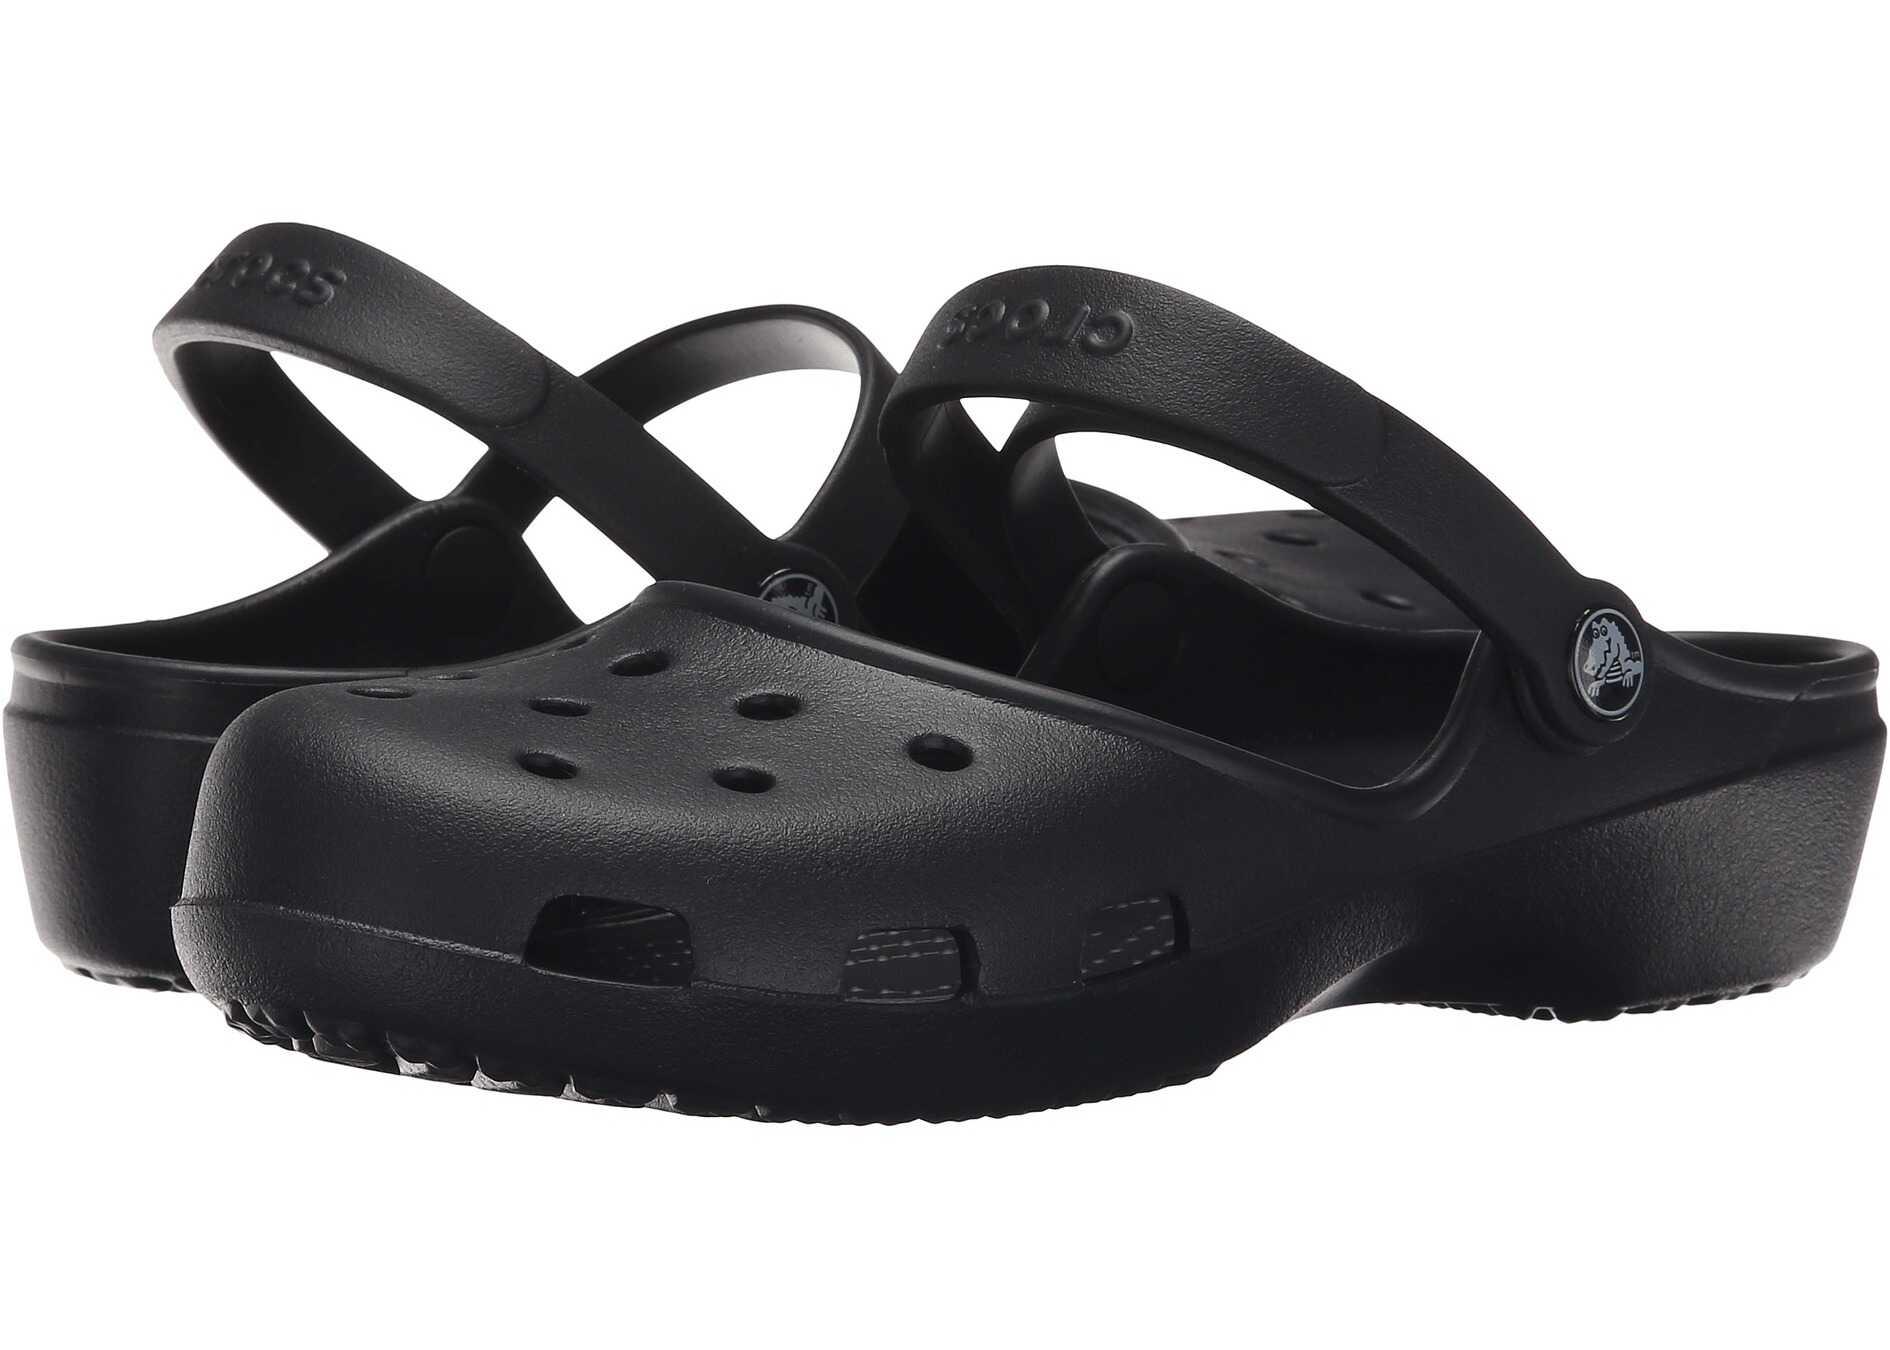 Crocs Karin Clog Black